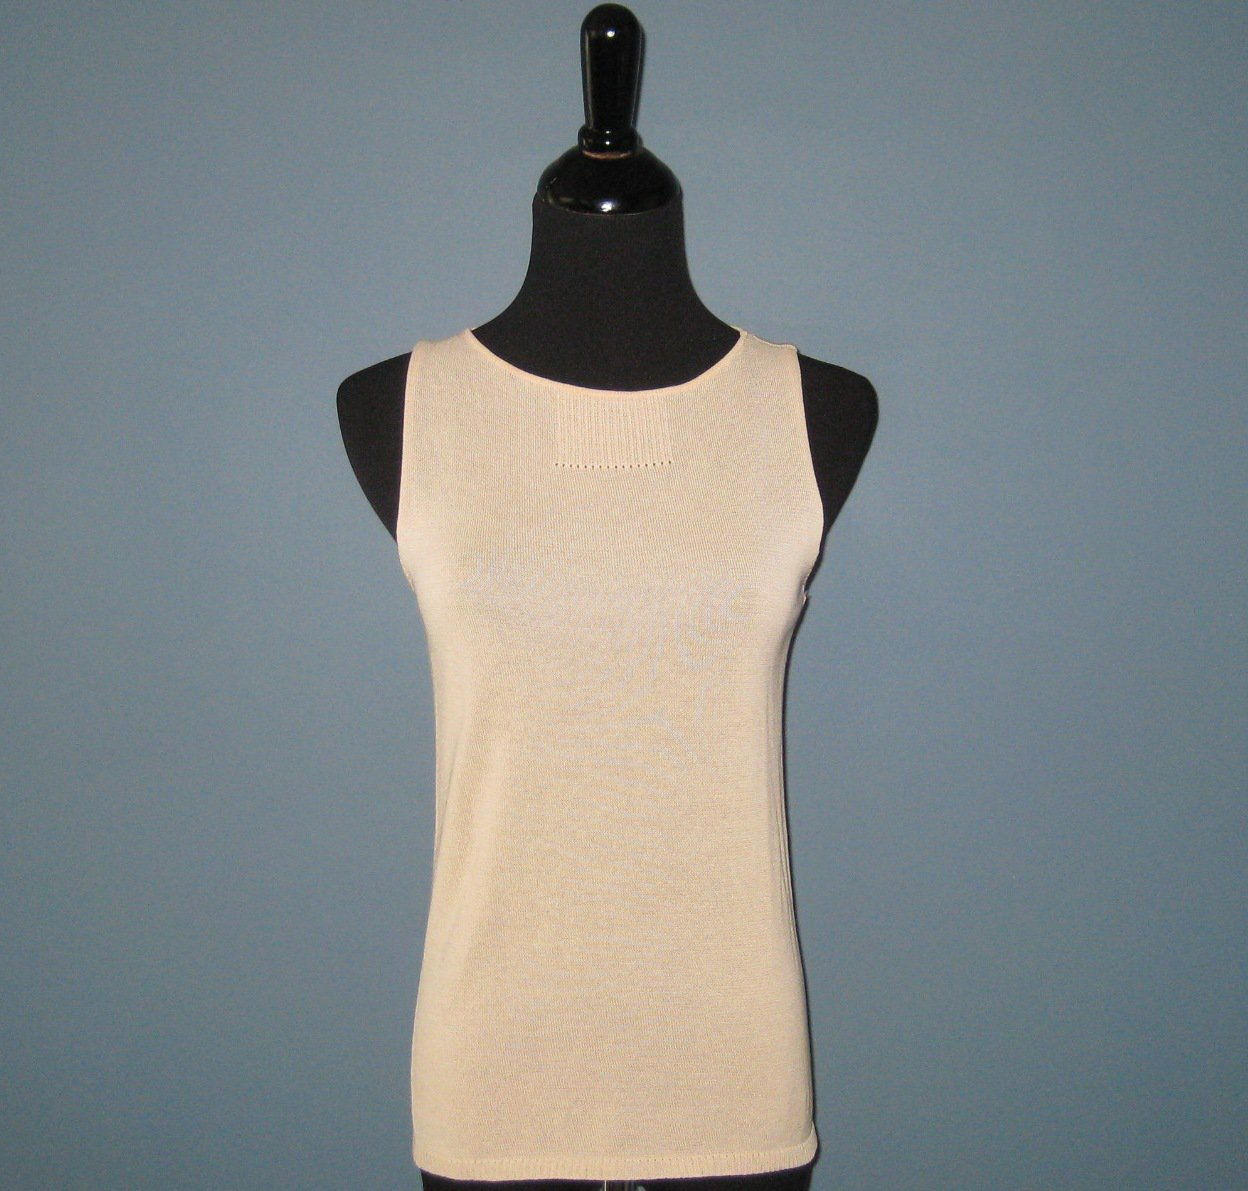 NWT Krizia Maglia Ecru Cotton Knit Tank Top Sweater - 40 (US 6) - FINAL SALE